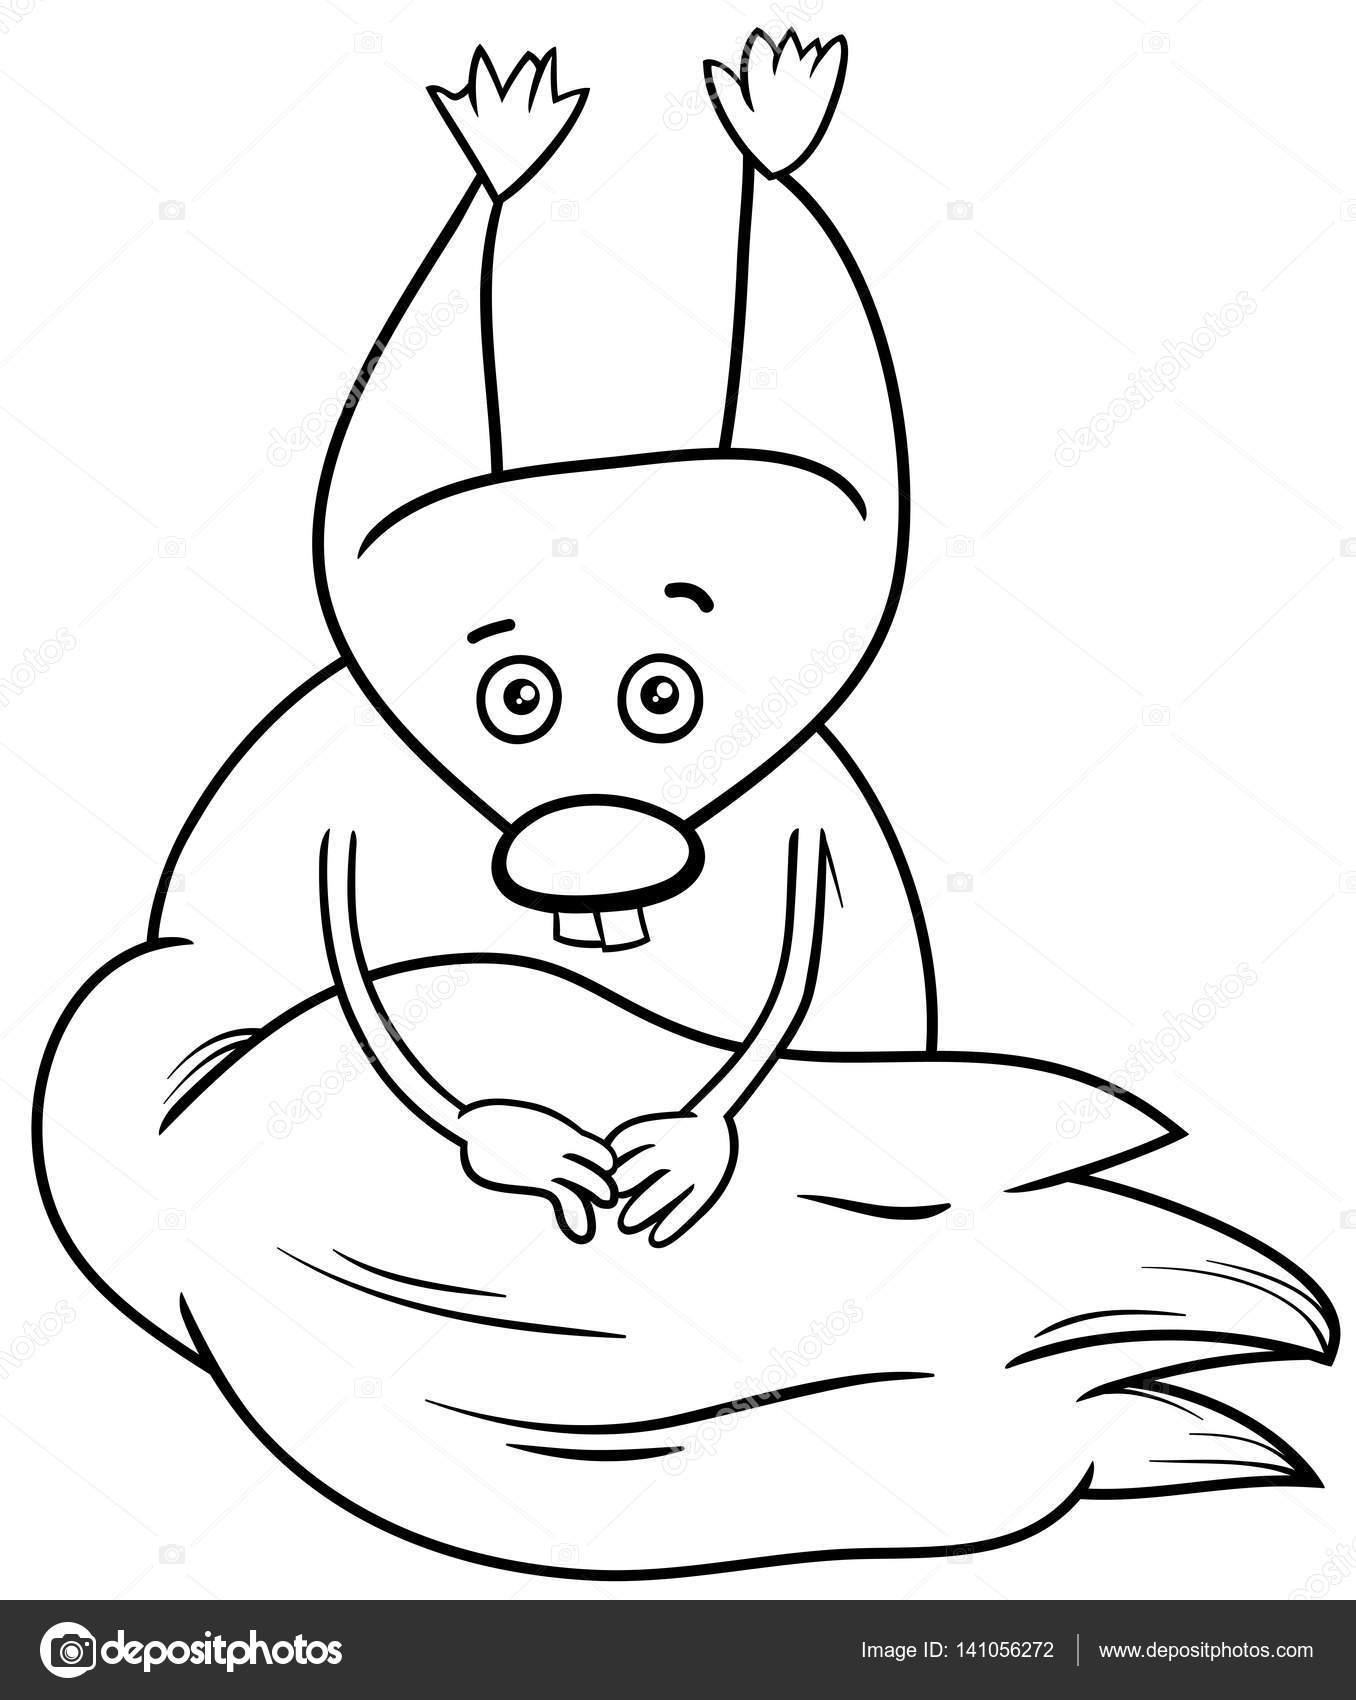 Kleurplaat Eekhoorn Cartoon Stockvector C Izakowski 141056272